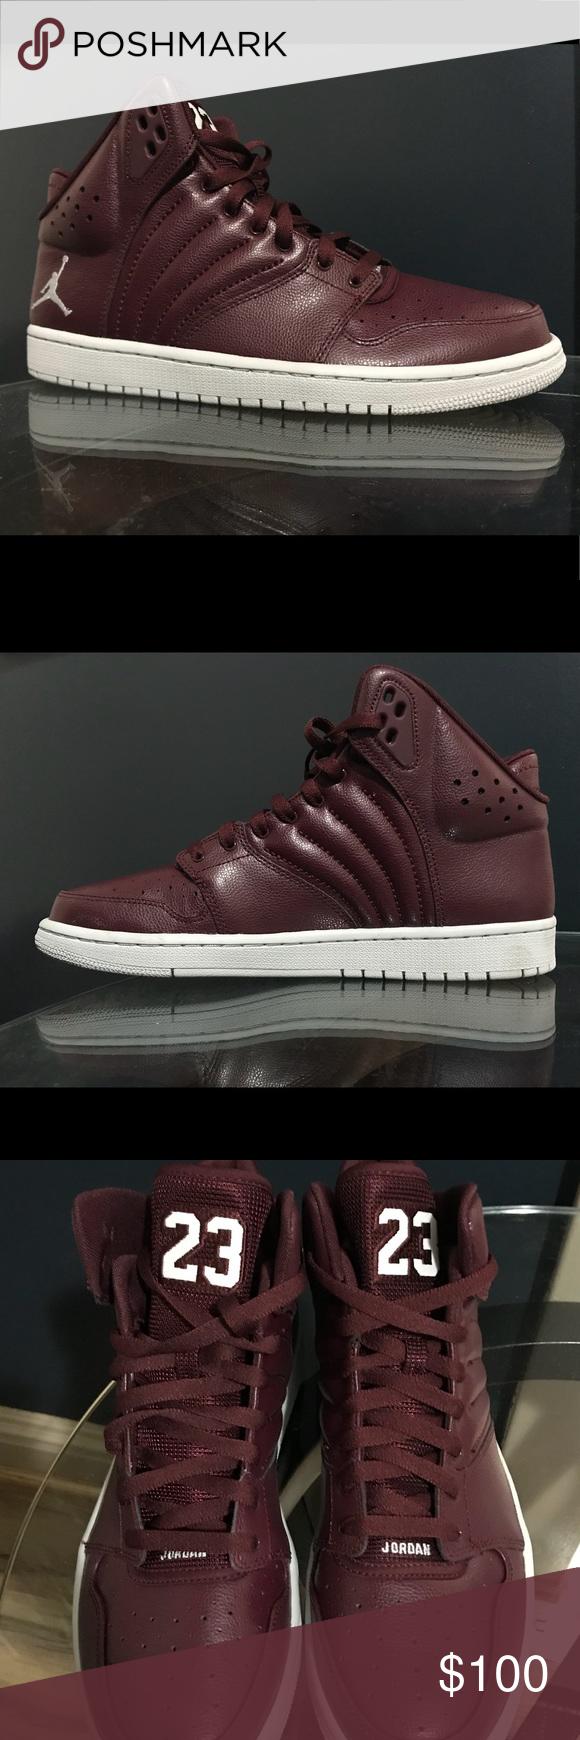 36ce74081673d6 NIB Jordan 1 Flight 4 Night Maroon Pure Platinum Jordan 1 Flight 4 in Night  Maroon and Pure Platinum New in box 820135 600 Men s size 10.5   8 Nike  Shoes ...